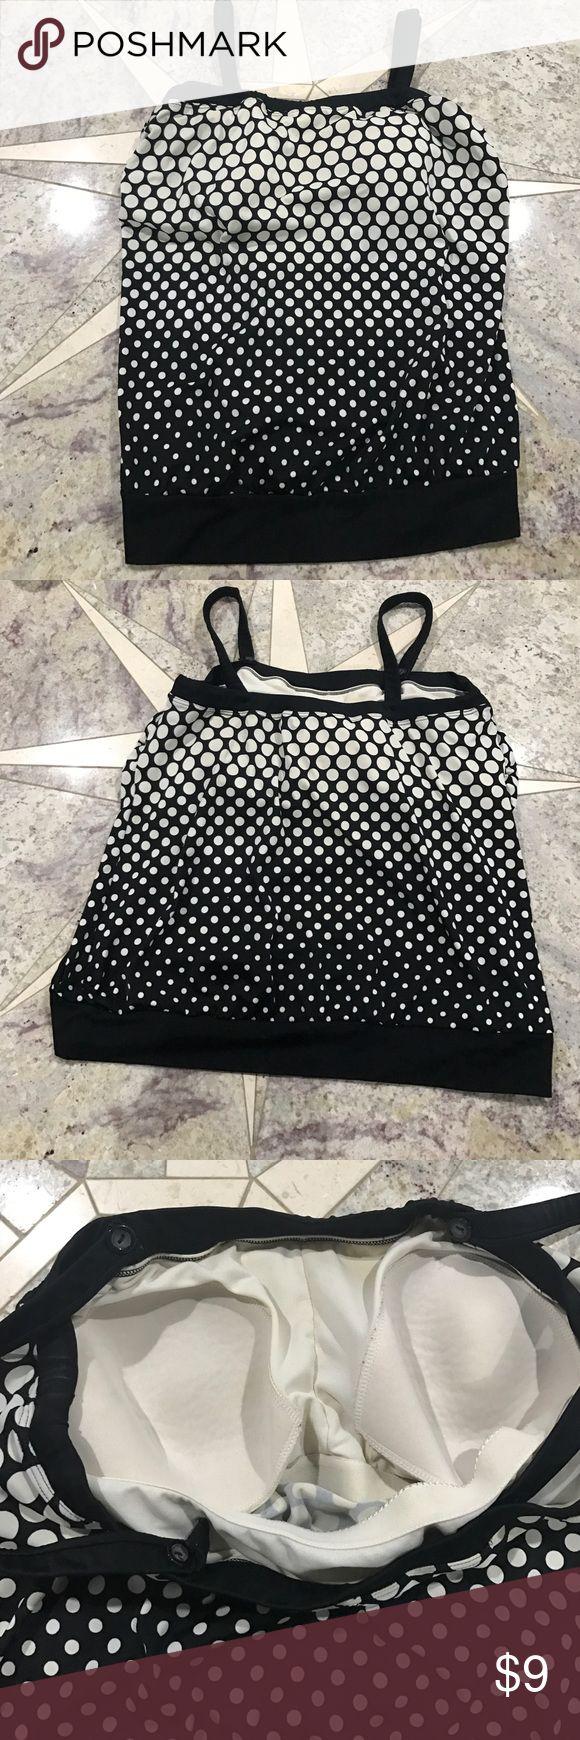 Black and White Polka Dot Tankini Top 🖤 Black and White Polka Dot Tankini Top 🖤 Merona Brand. Size 22W Merona Swim